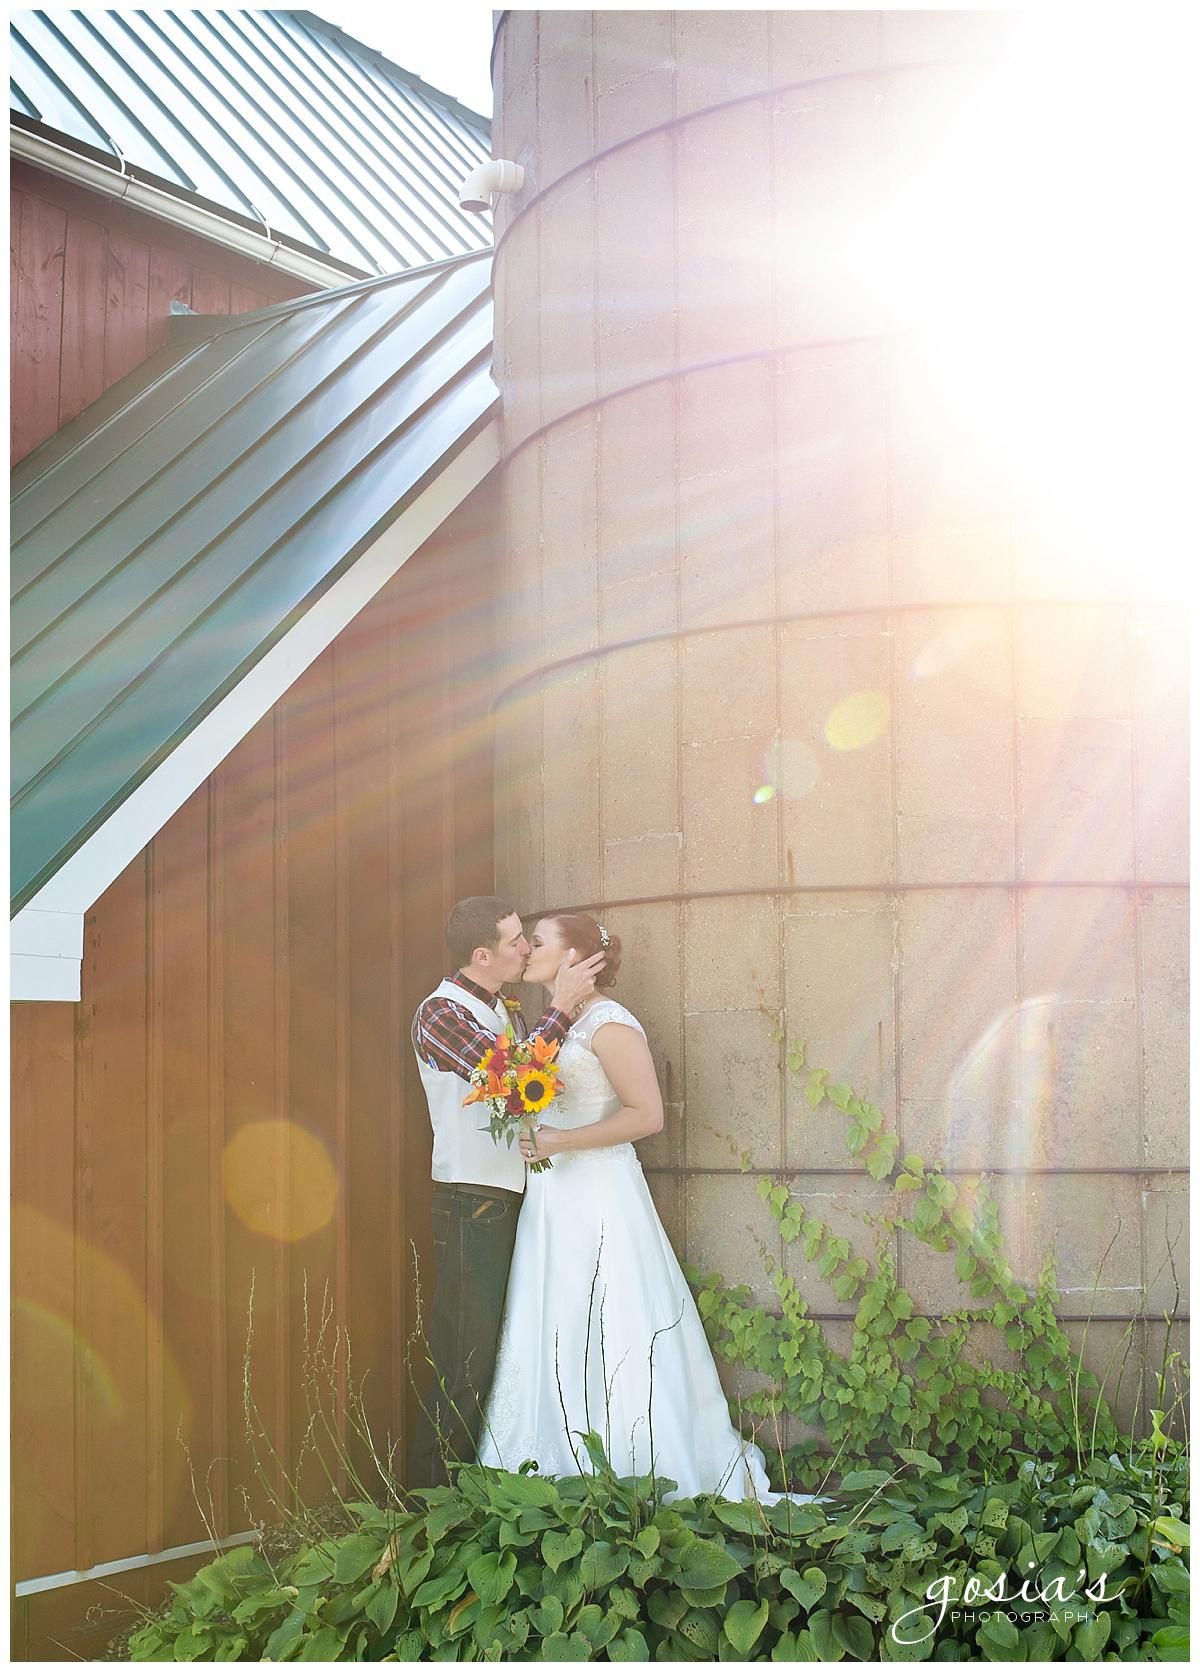 Gosias-Photography-wedding-photographer-Appleton-Homestead-Meadows-outdoor-ceremony-reception-Rachel-Zach-_0027.jpg